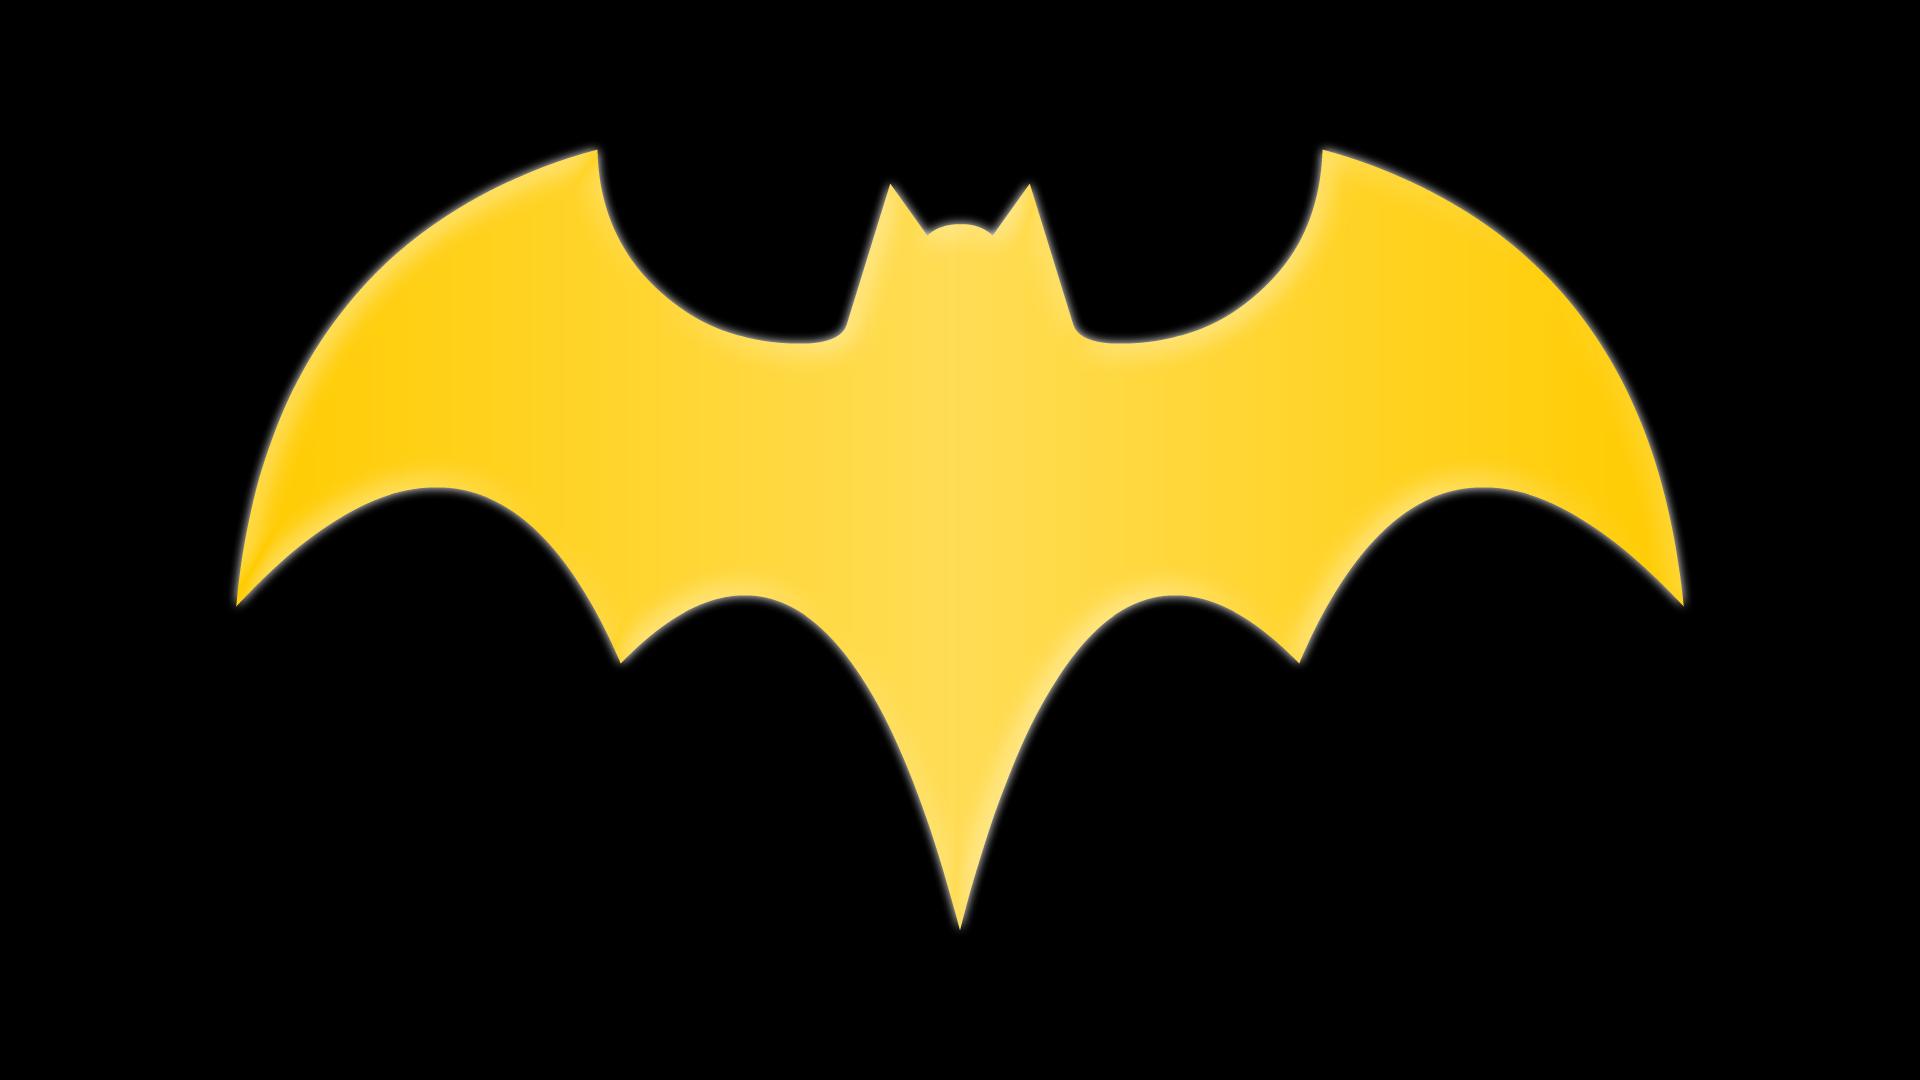 Batgirl Symbol Batgirl Symbol Batgirl Cassandra Cain Batgirl Costume